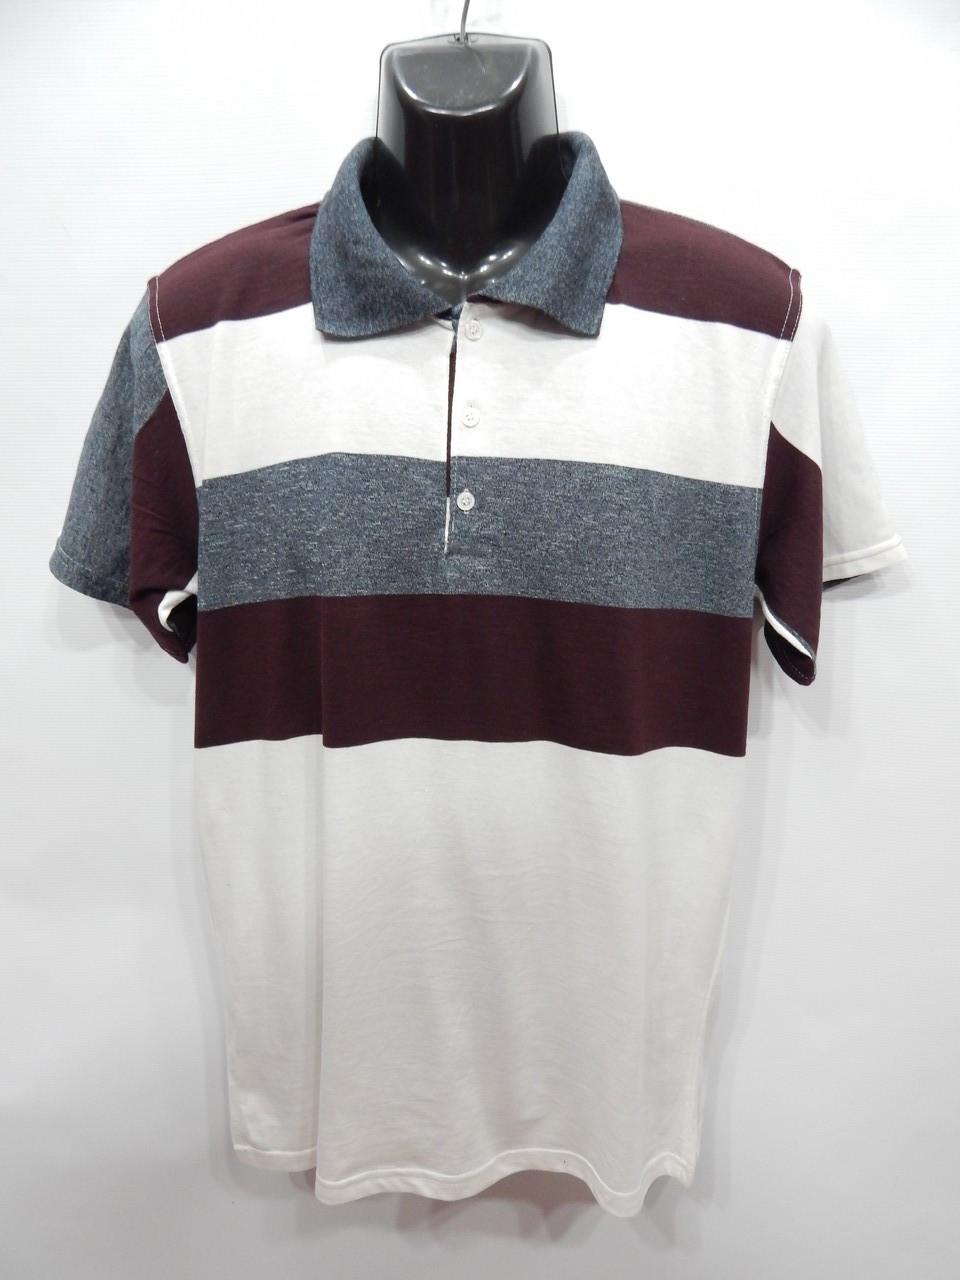 Мужская футболка поло Clartex collection р.50 001мф